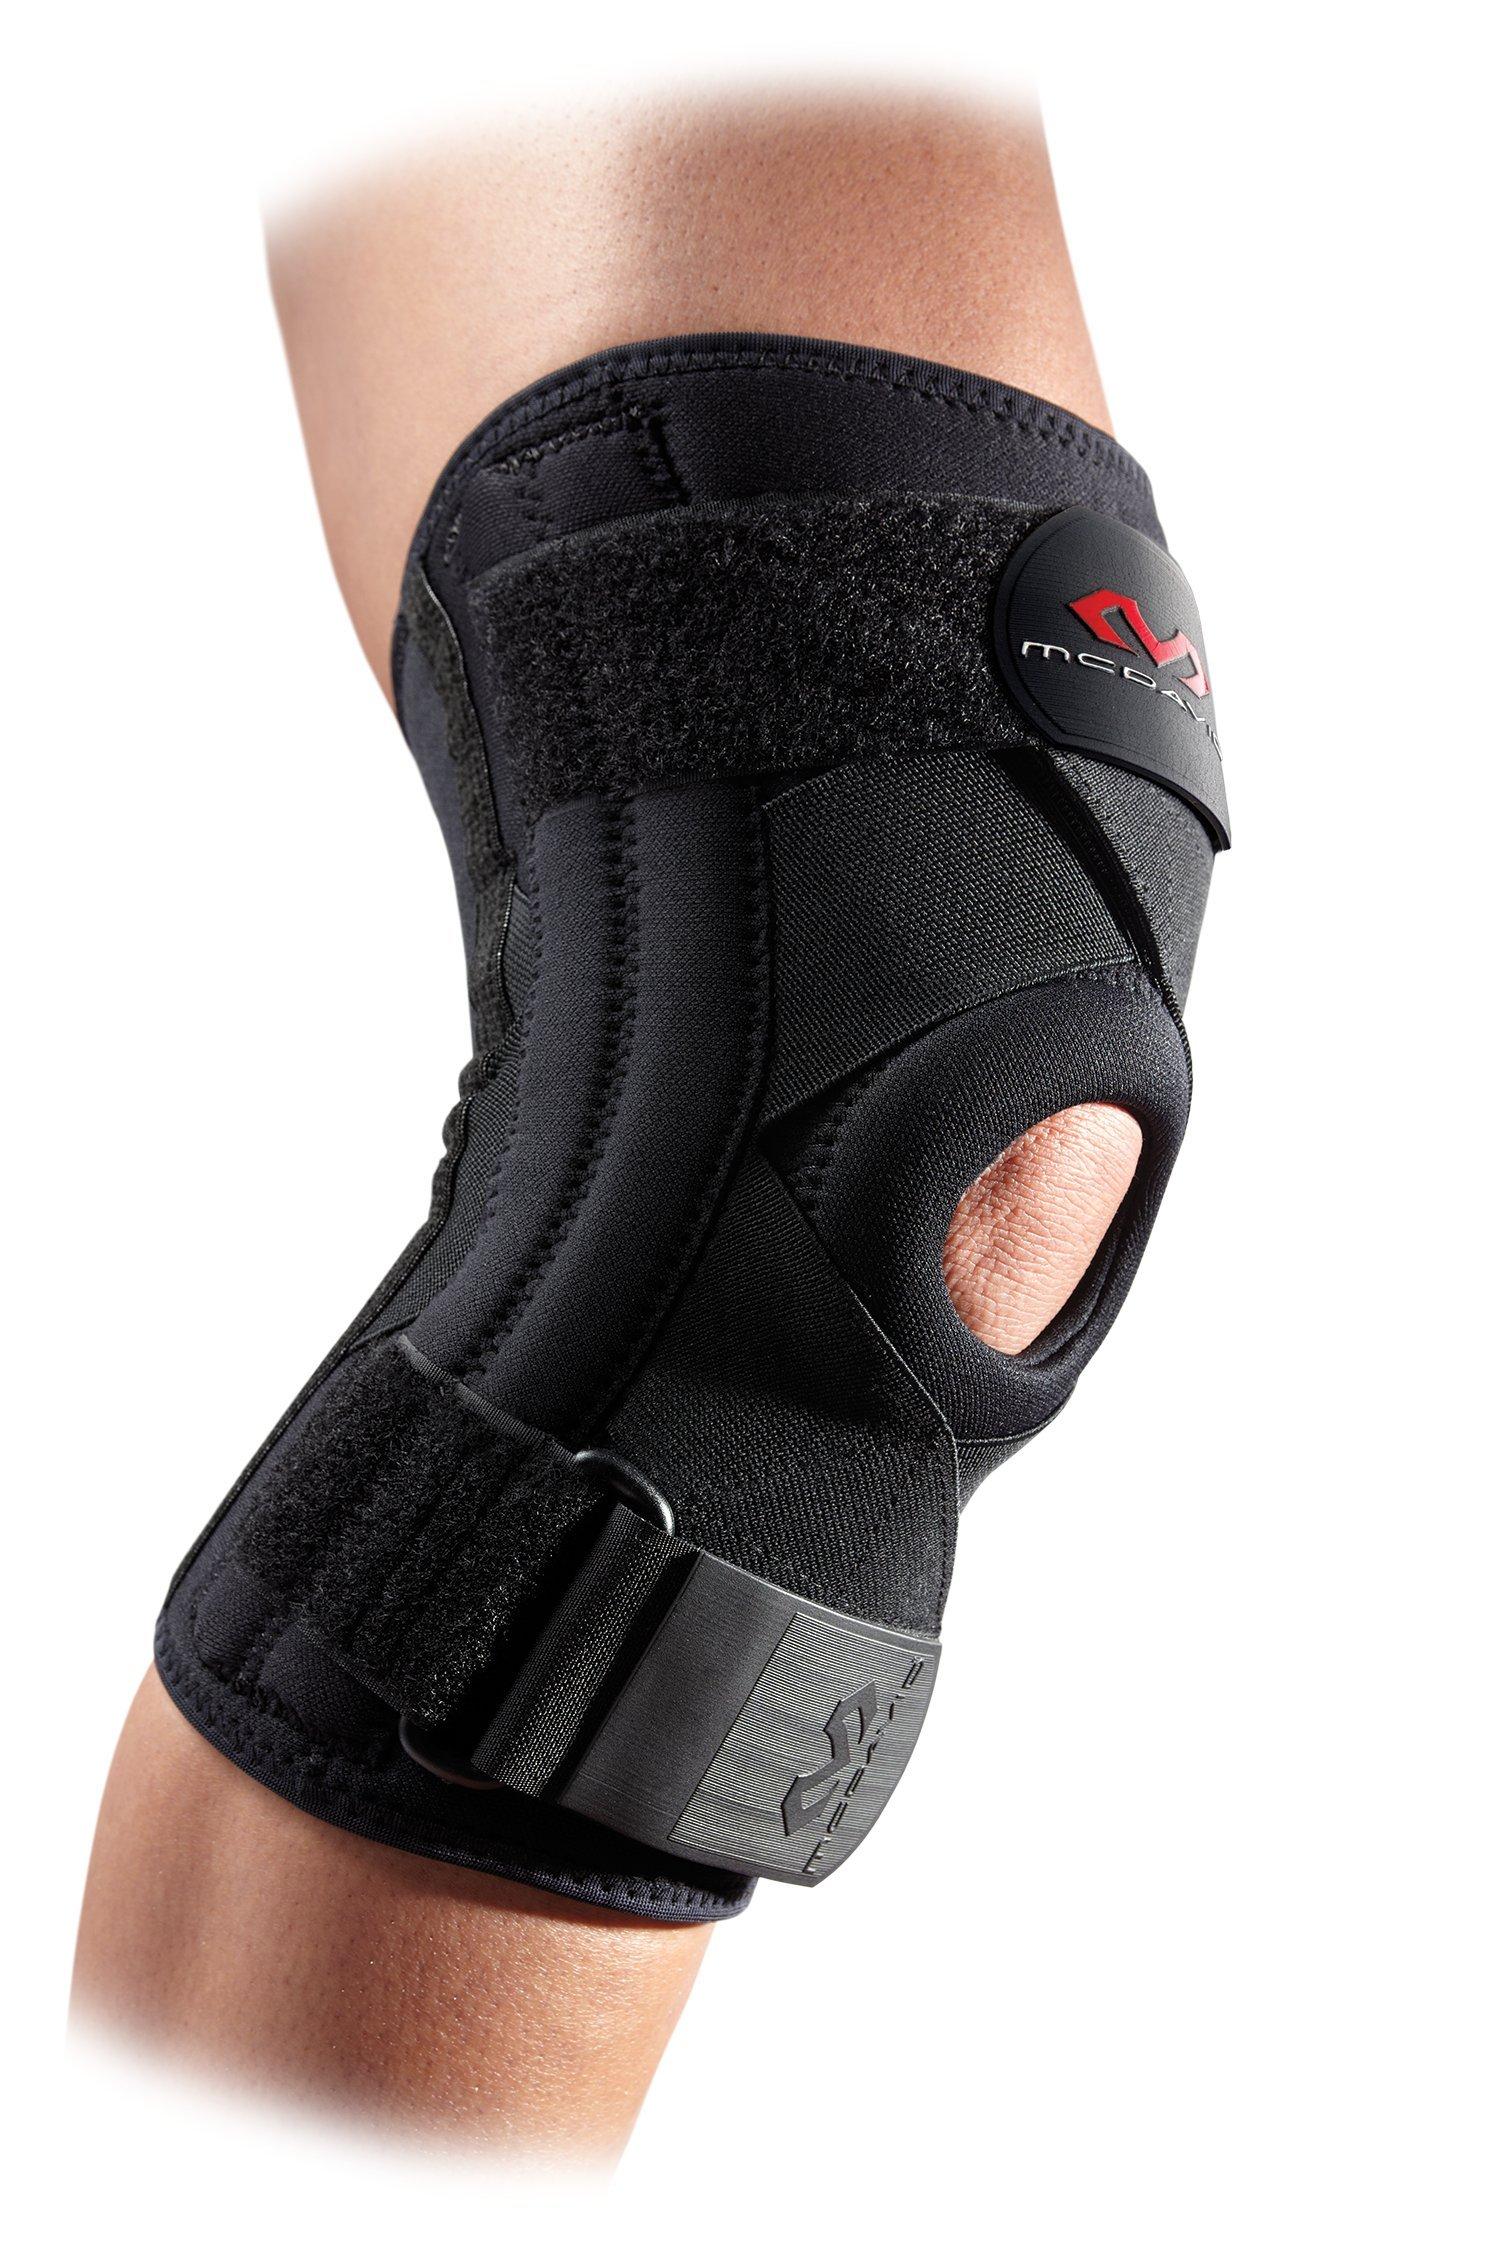 McDavid Ligament Knee Support (Black, Medium), Level 2